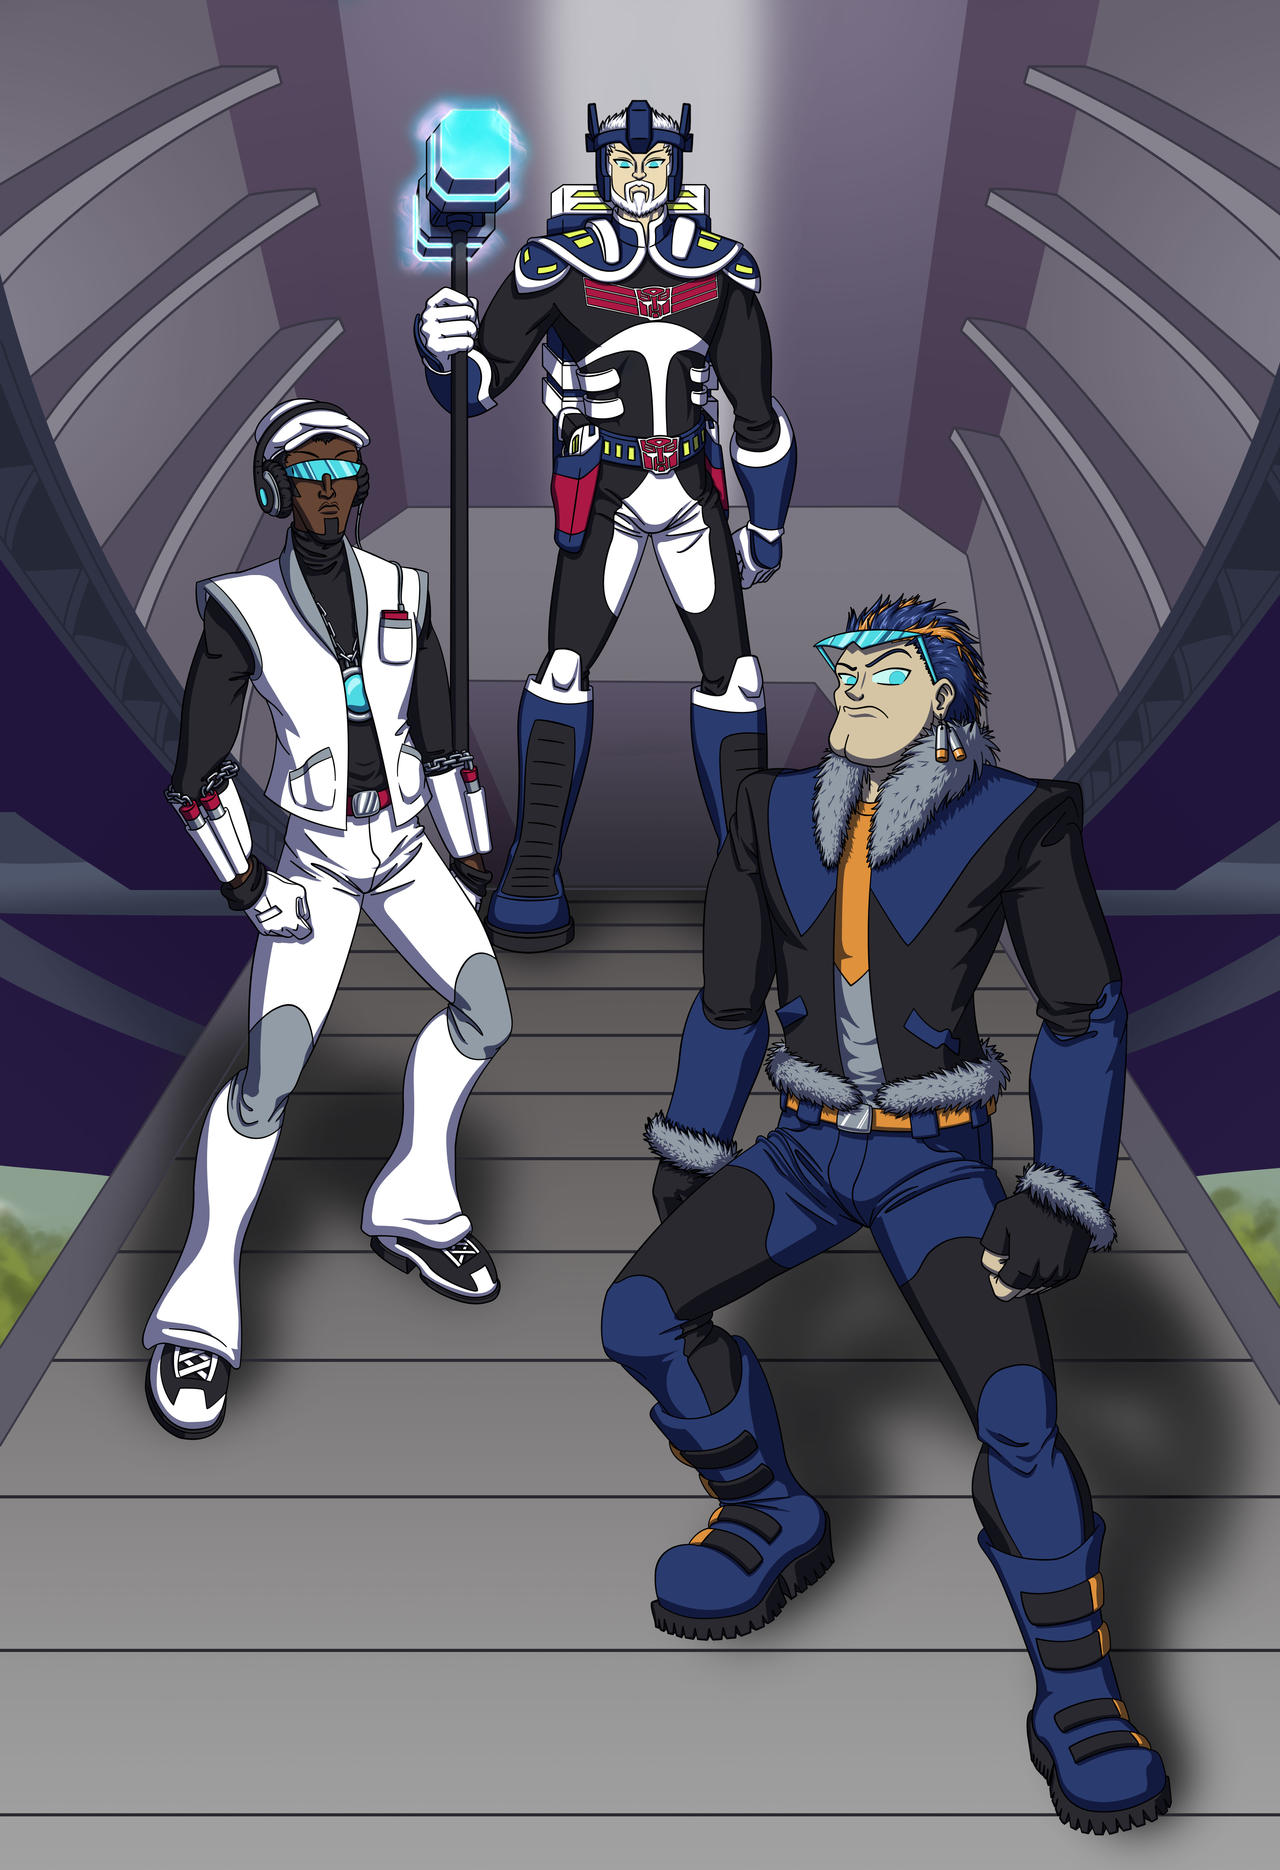 Transformers Animated By Mystryl-shada On DeviantArt